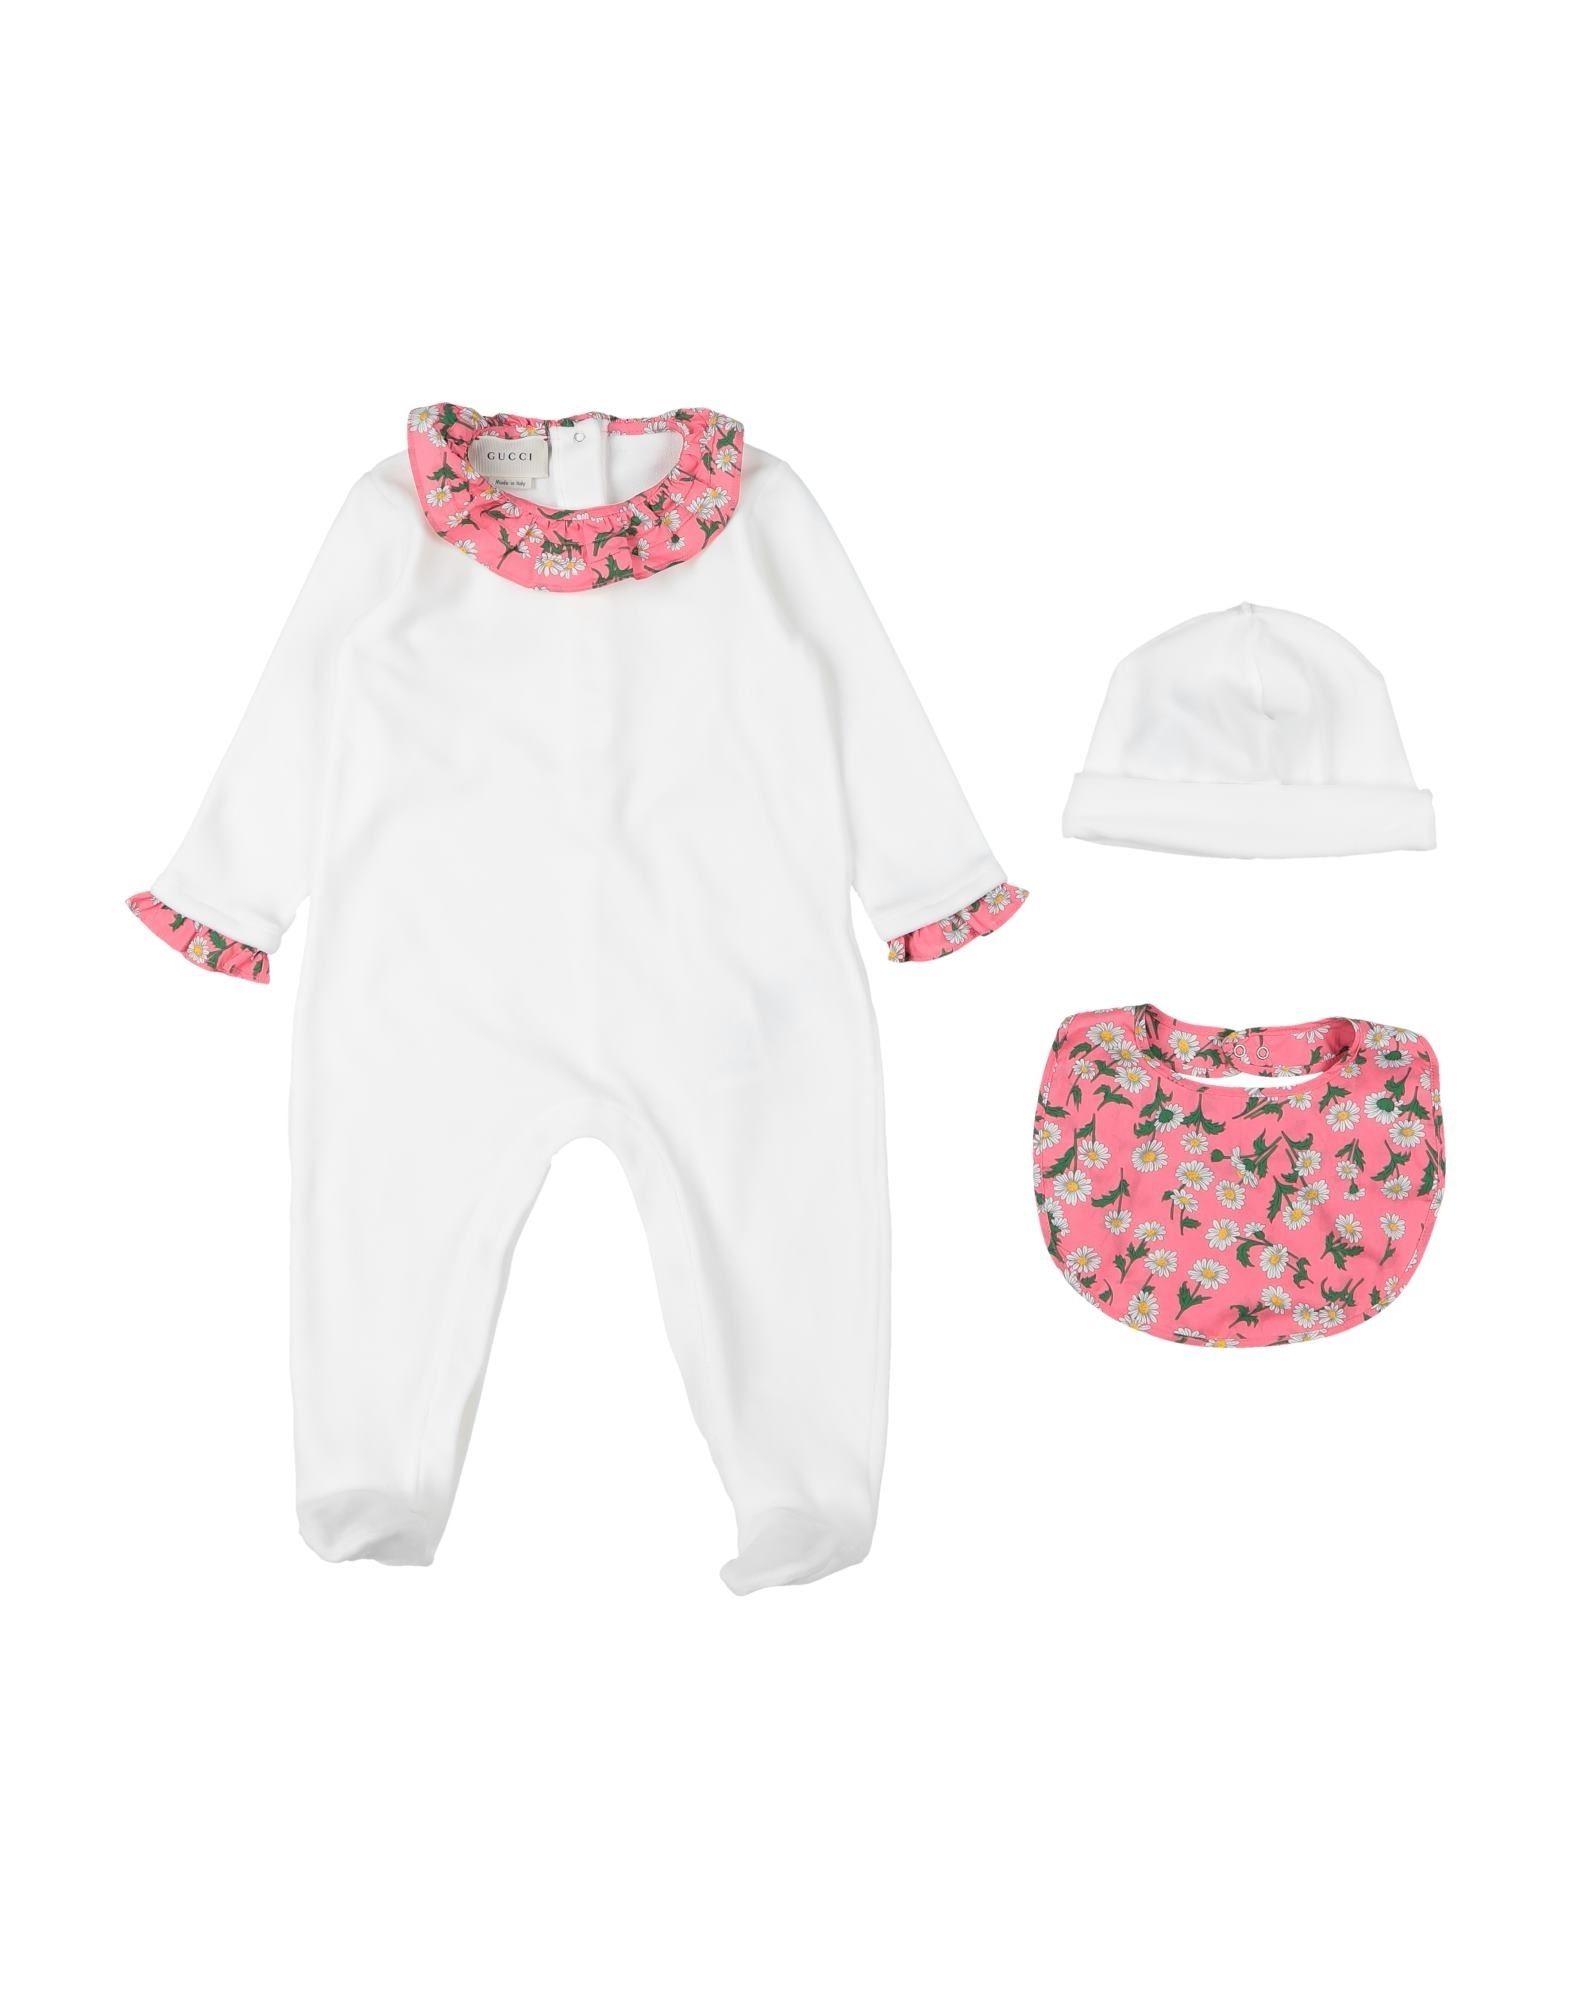 YOOX.COM(ユークス)《セール開催中》GUCCI ガールズ 0-24 ヶ月 乳幼児用ロンパース アイボリー 3 コットン 80% / ナイロン 20%